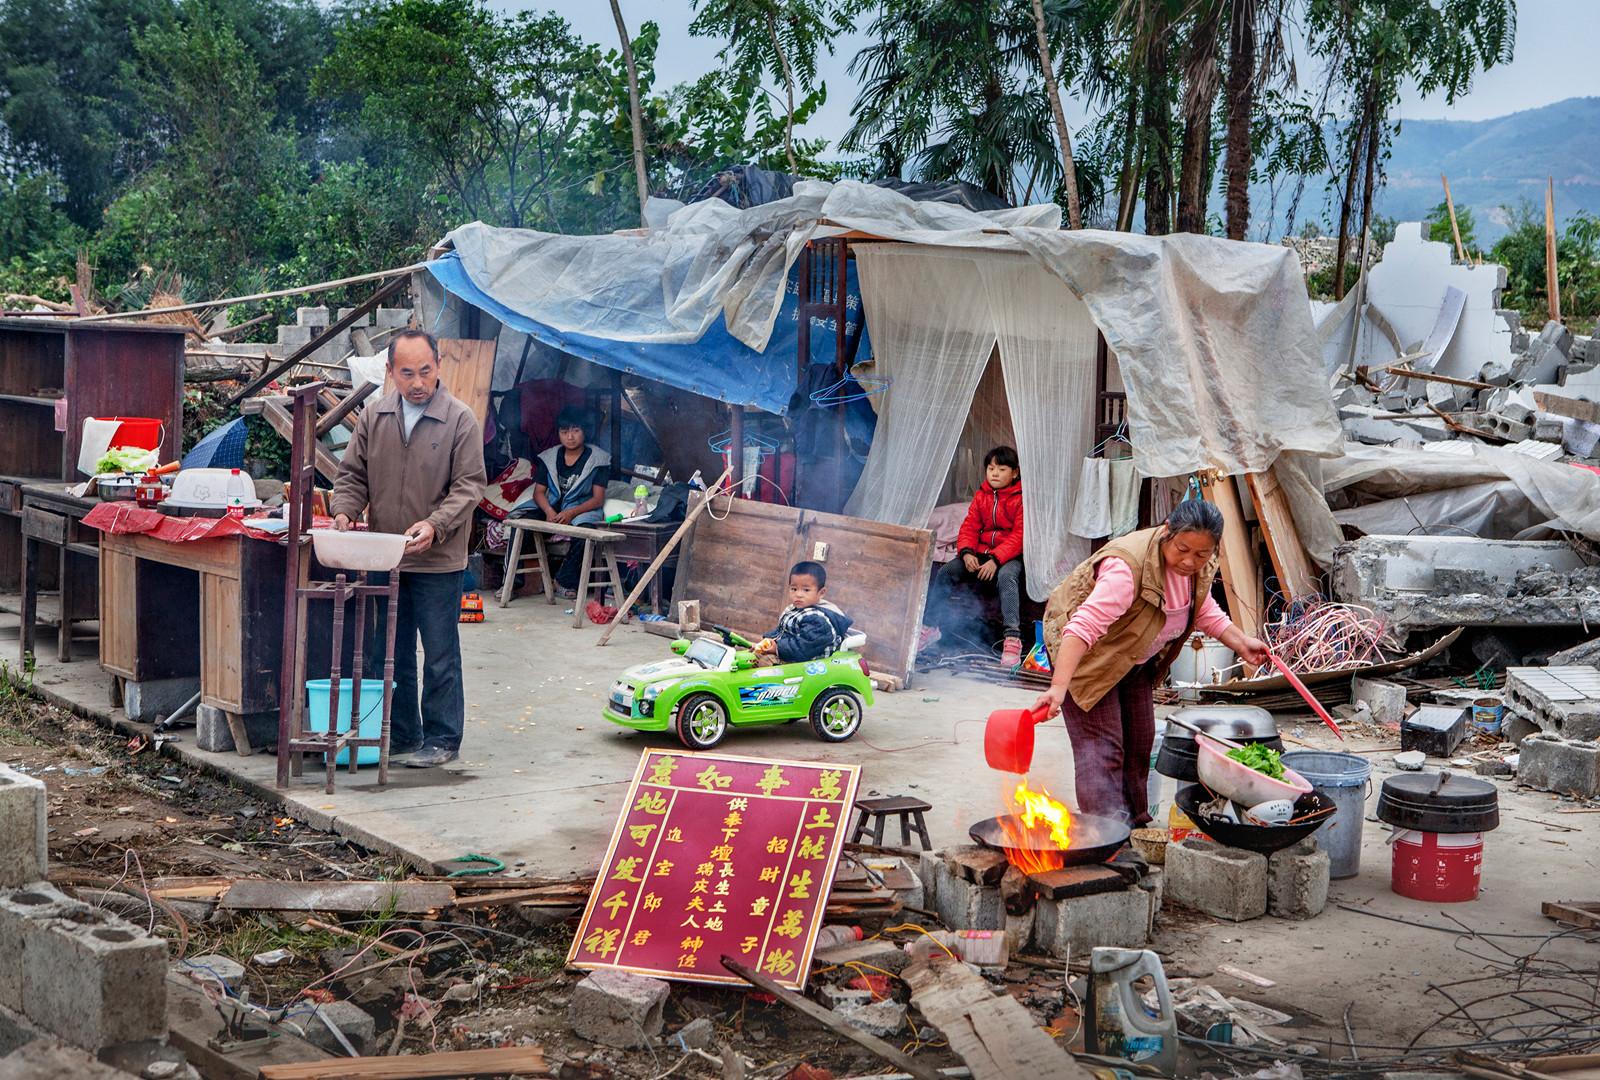 kuang-huimin-lost-dreams-in-tuokou-photography-of-china-4.jpg